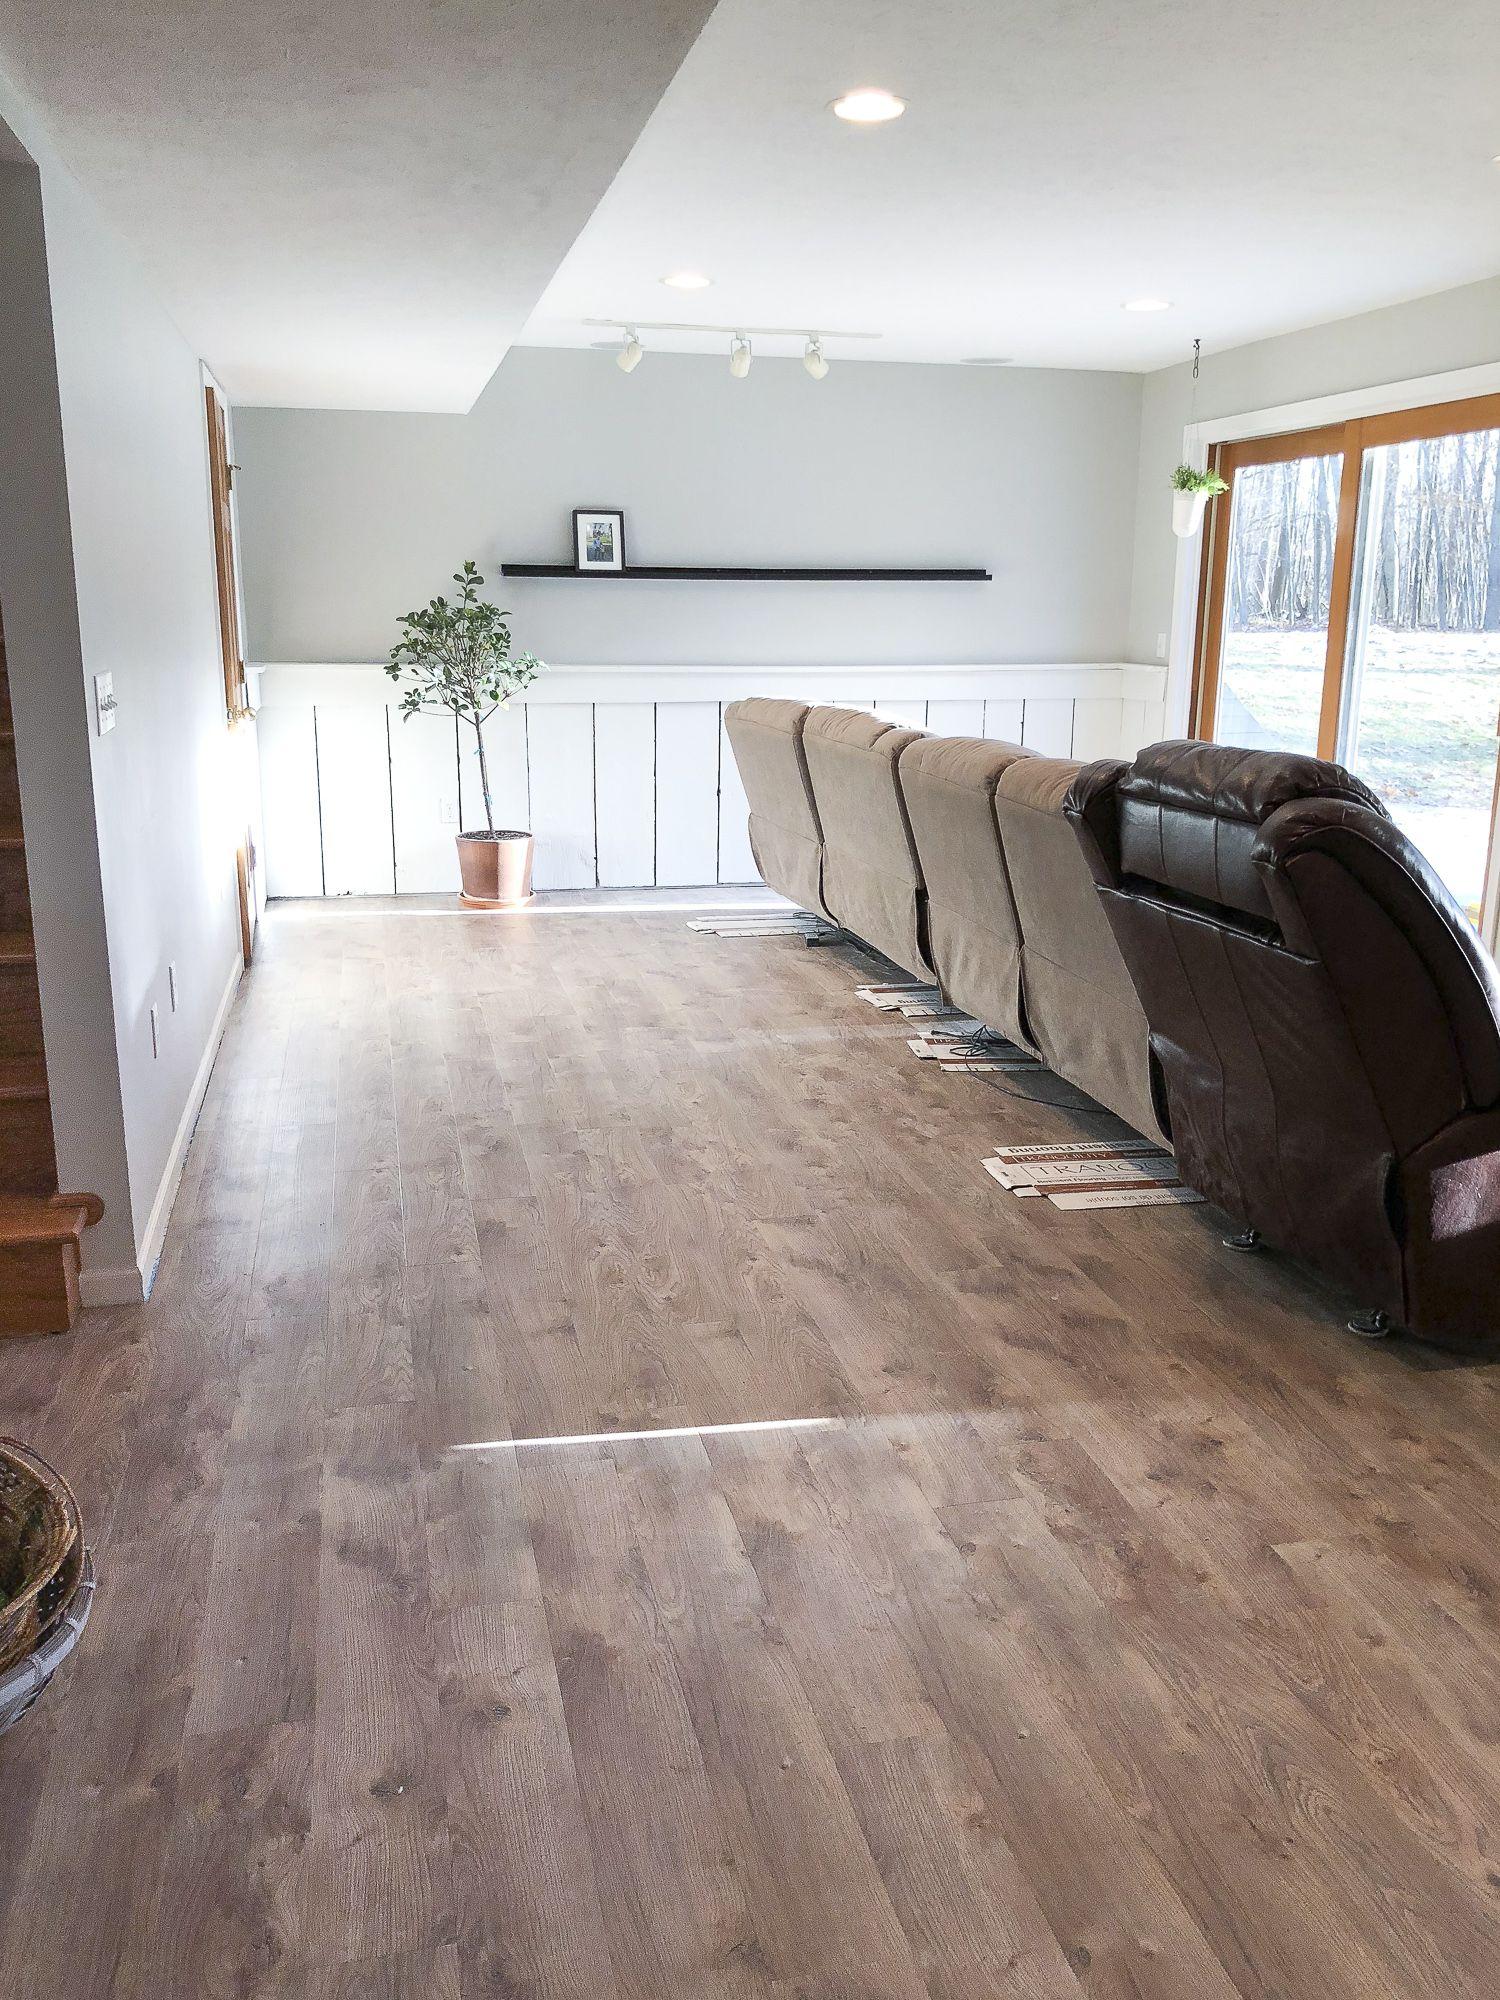 15 diy basement flooring ideas